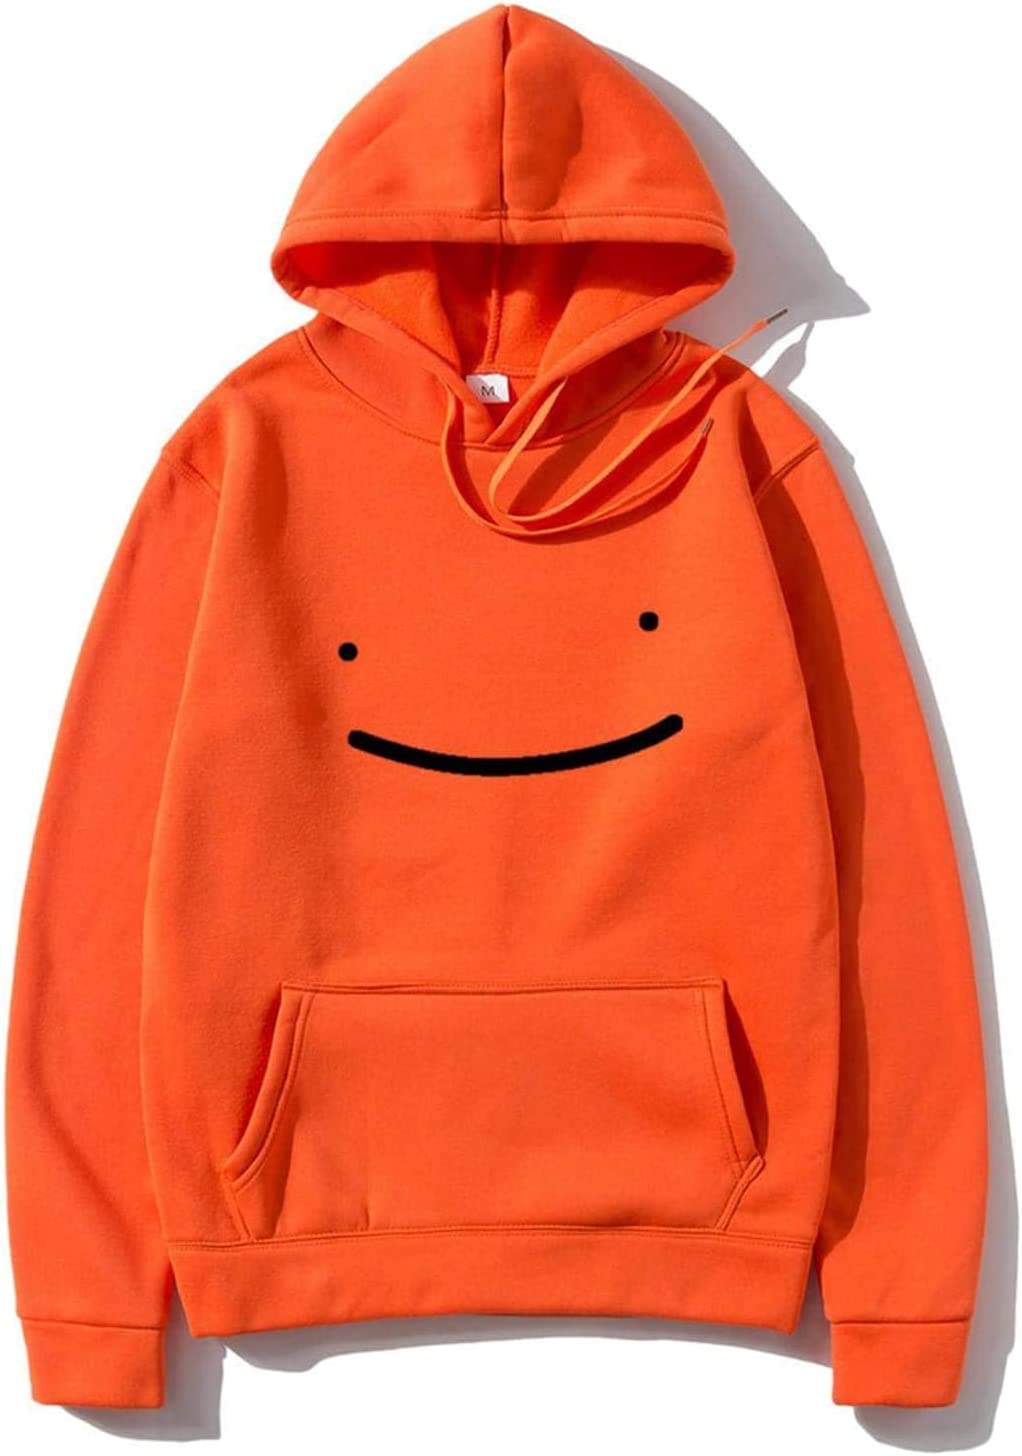 MAORR Cartoon Hooded Sweater, Moletom Com Capuz Moletom Masculino Feminino Harajuku Pullover Moletom Streetwear Moda Casual Roupas Grandes (Color : 26, Size : -S)